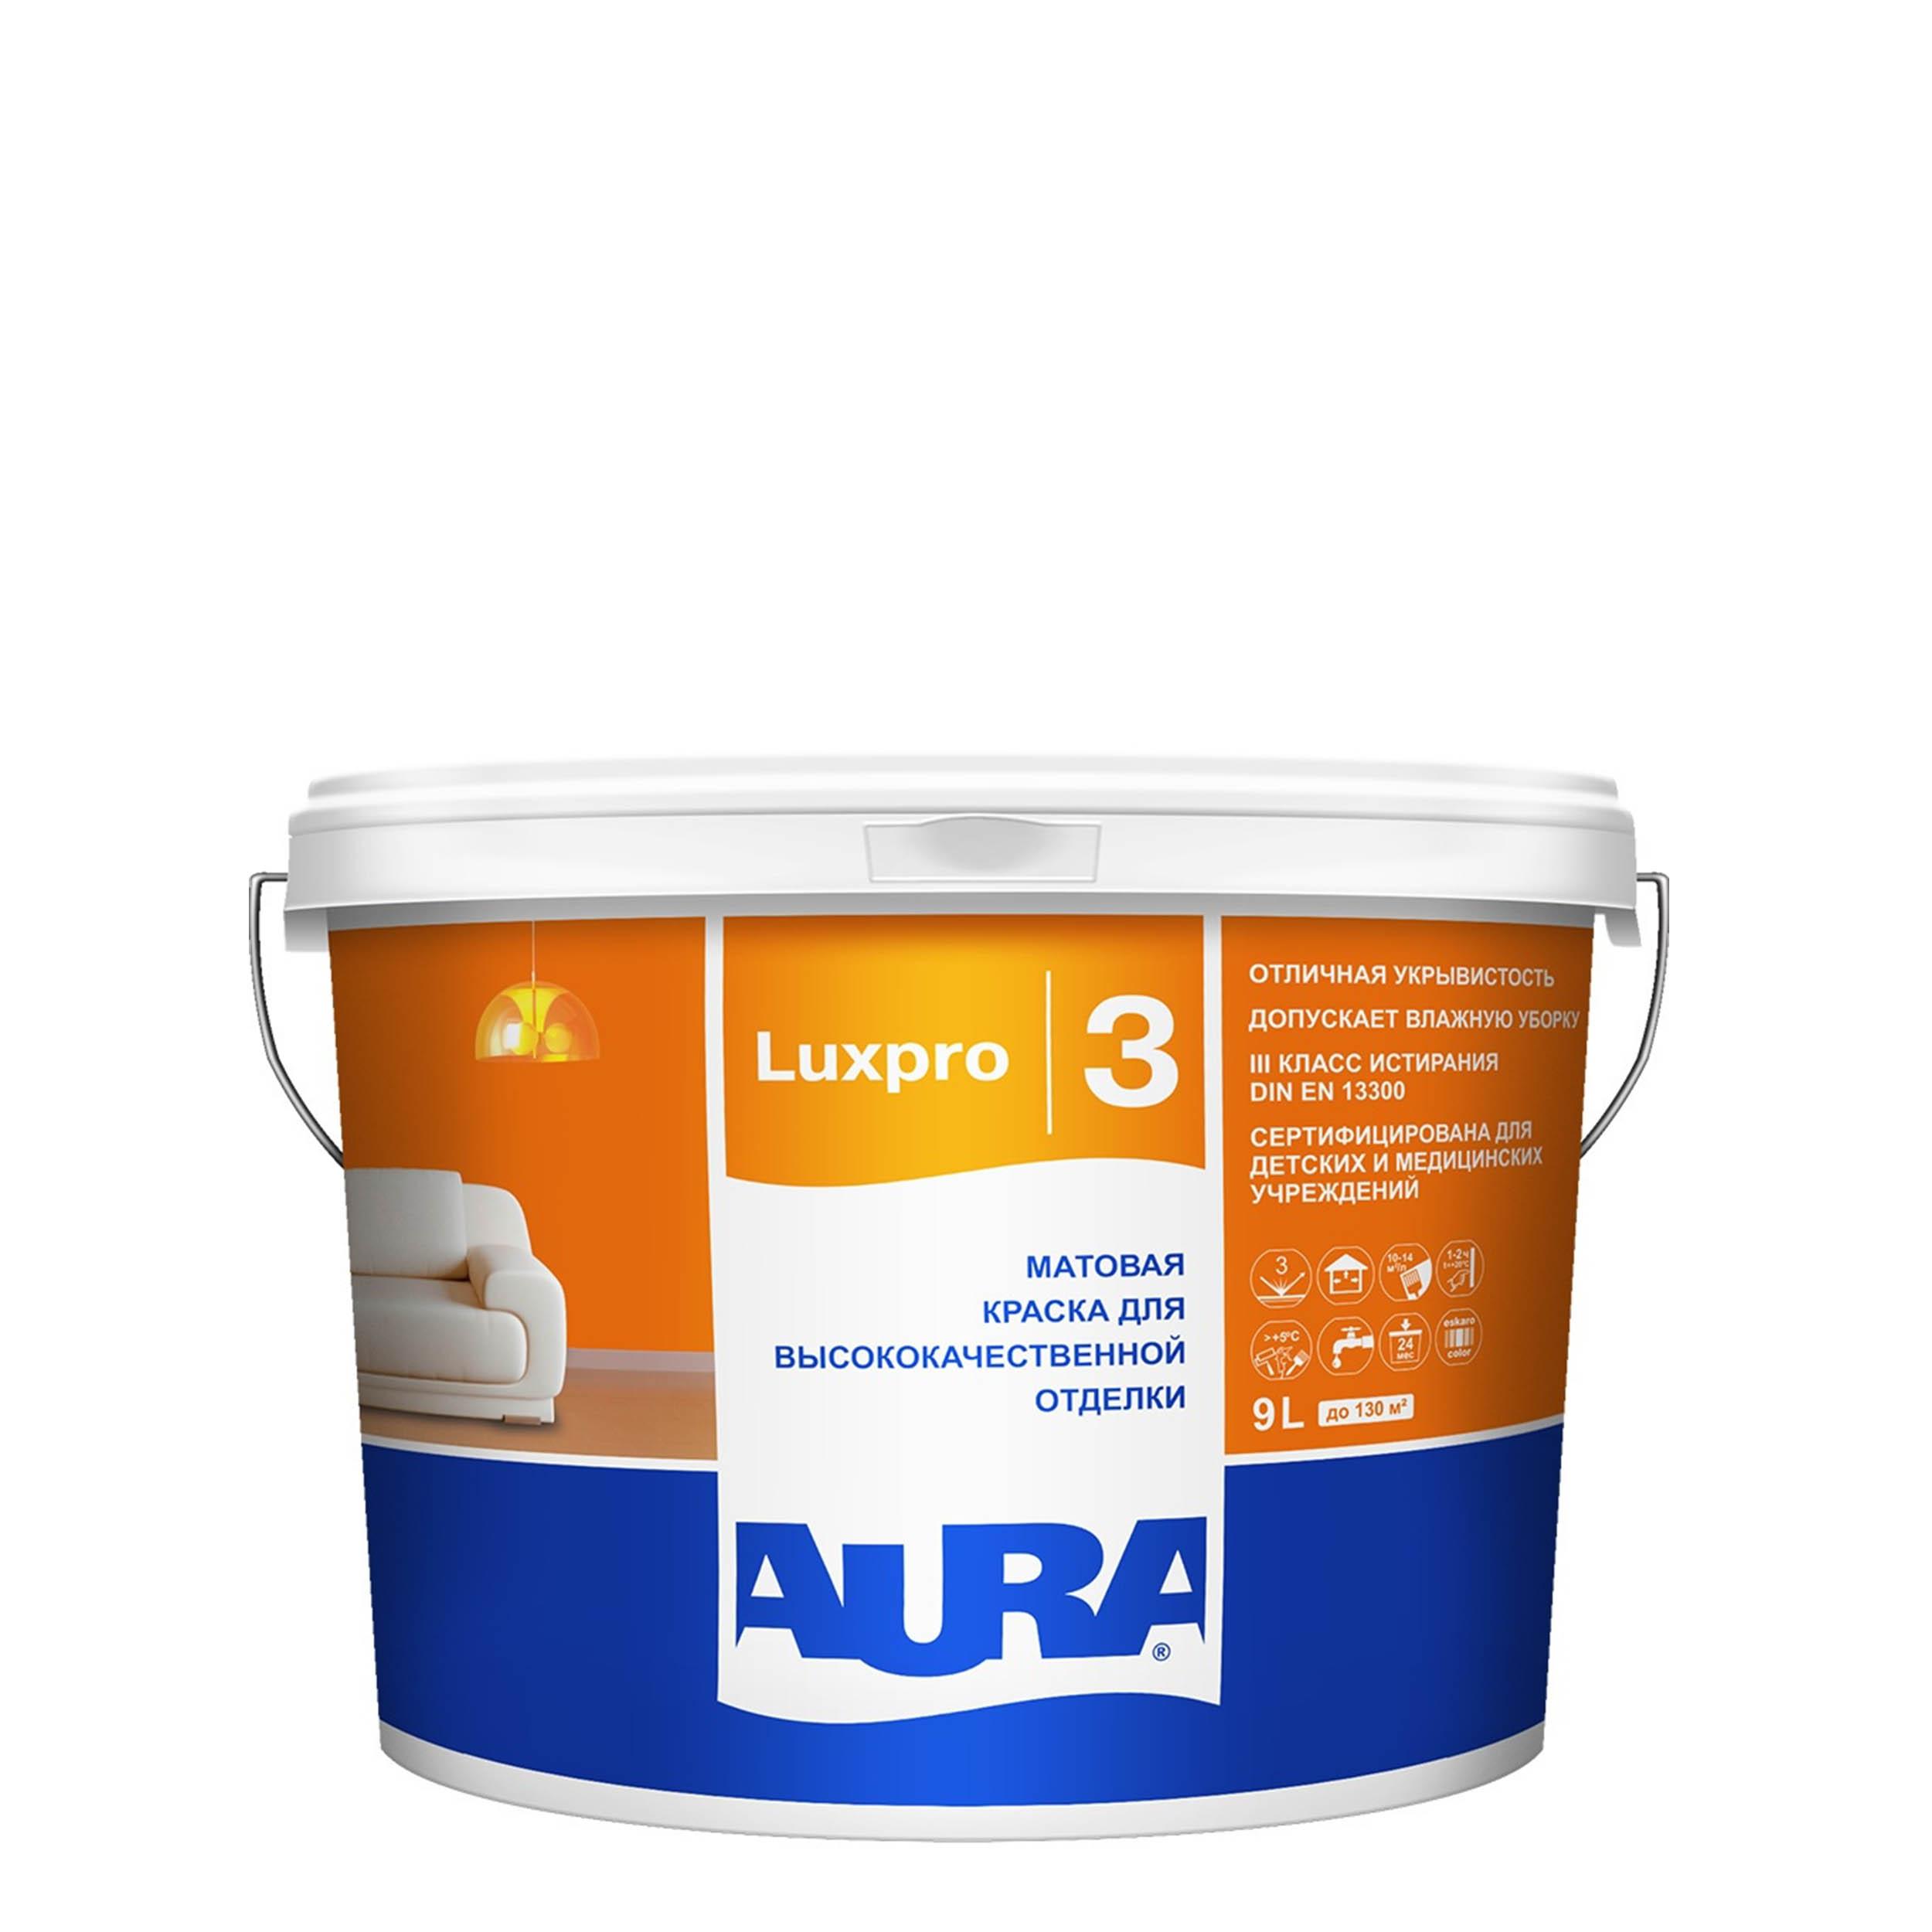 Фото 3 - Краска интерьерная, Aura LuxPRO 3, RAL 6002, 11 кг.